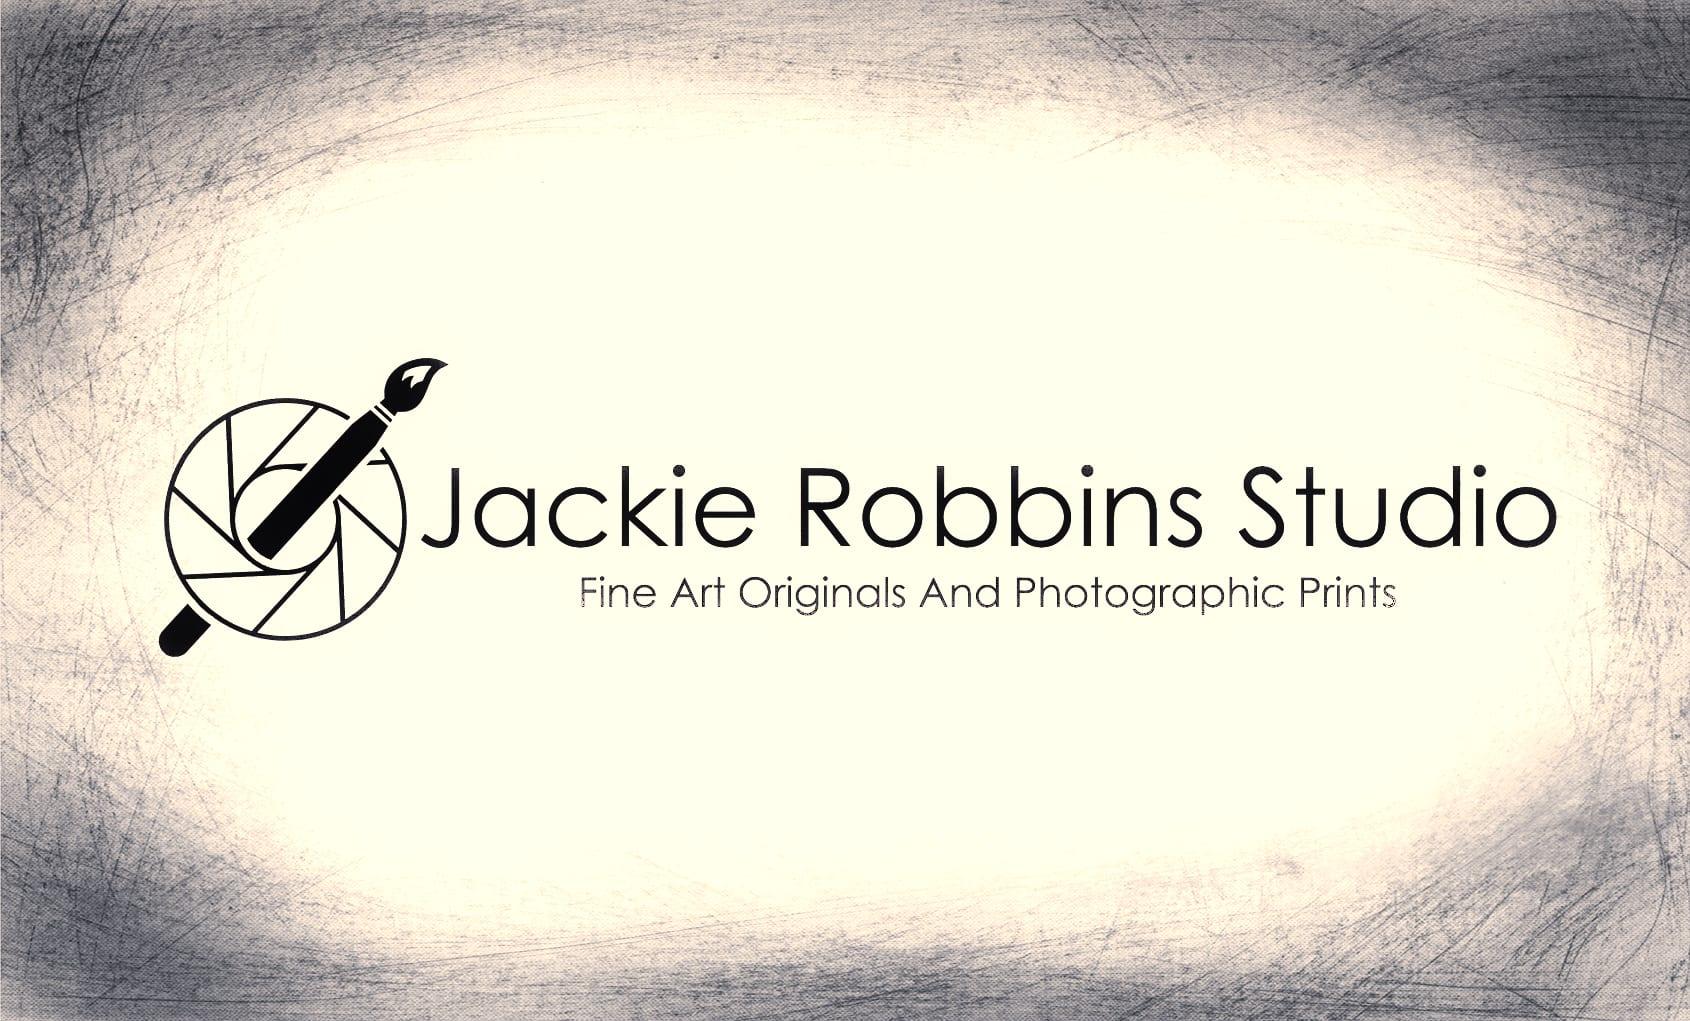 JackieRobbinsStudio